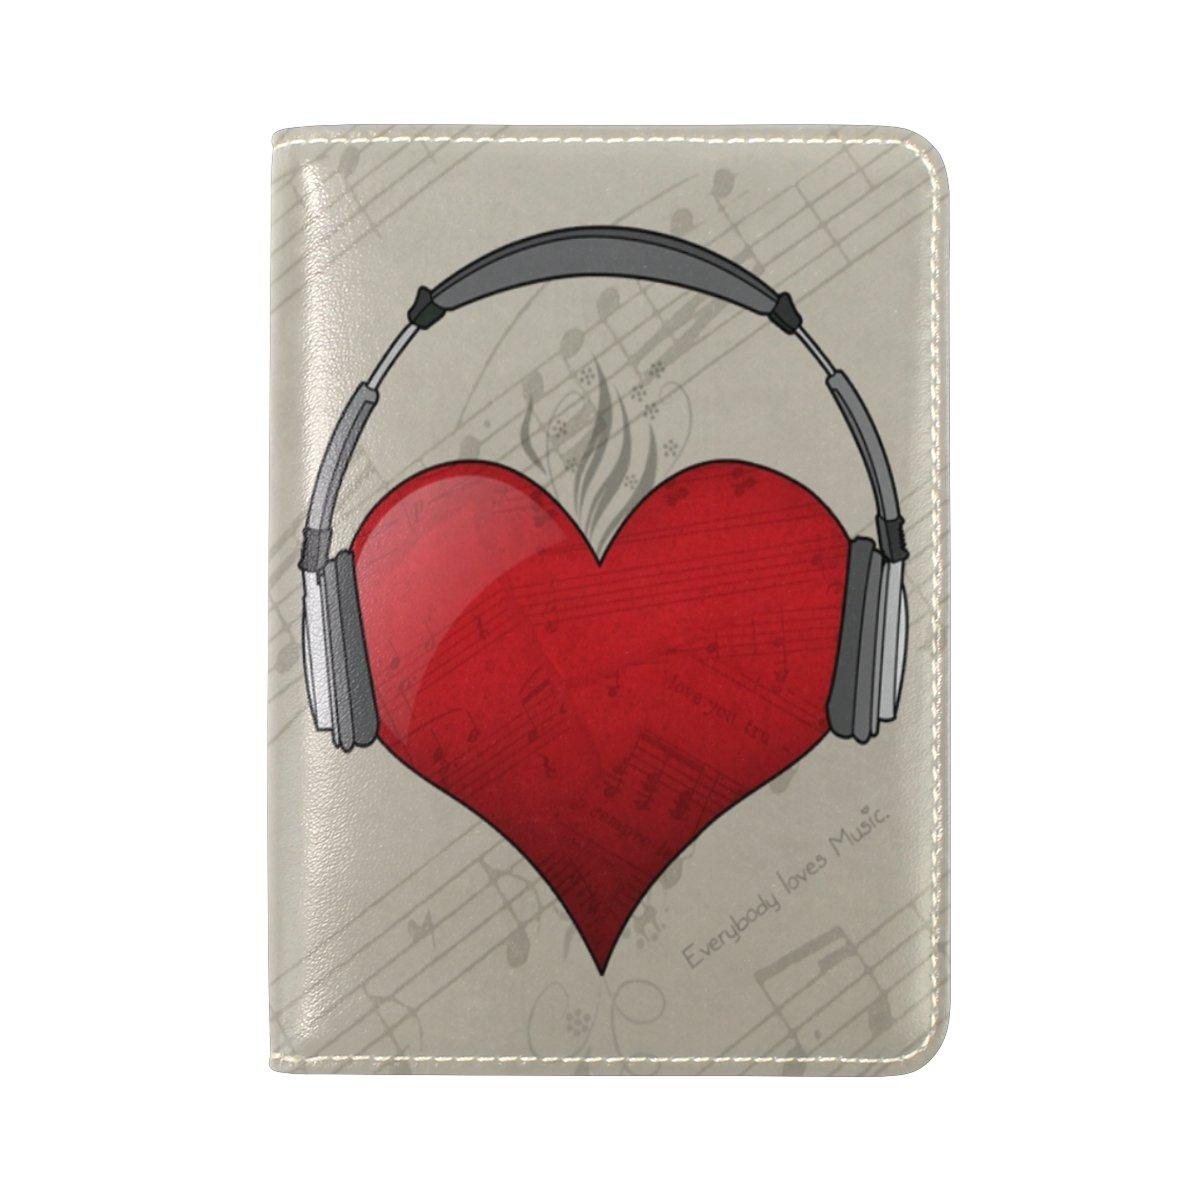 FENNEN Music Heart Genuine Real Leather Passport Holder Cover Travel Case